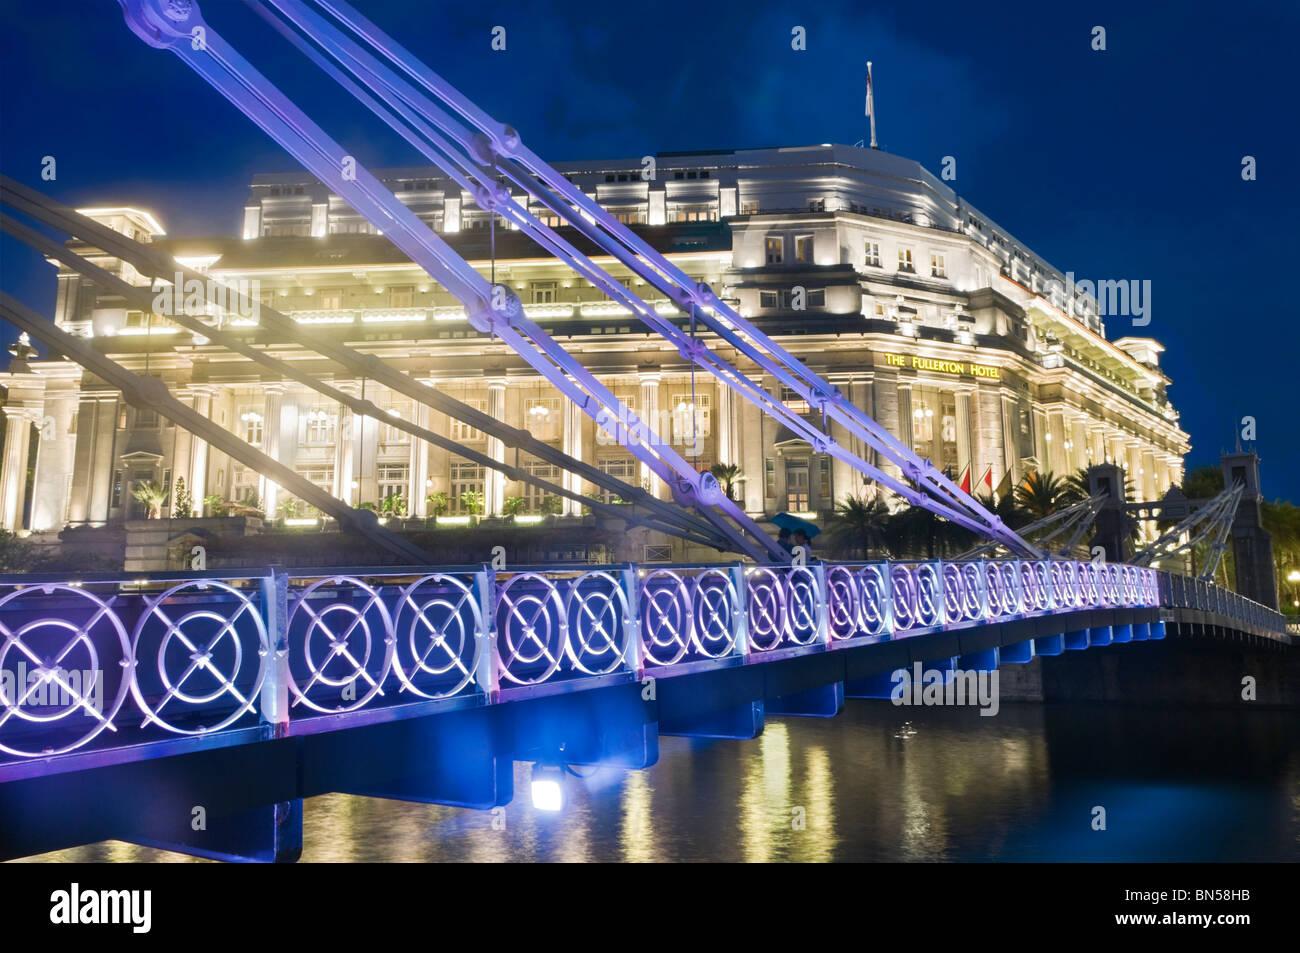 Cavenagh Bridge and Fullerton Hotel Singapore - Stock Image